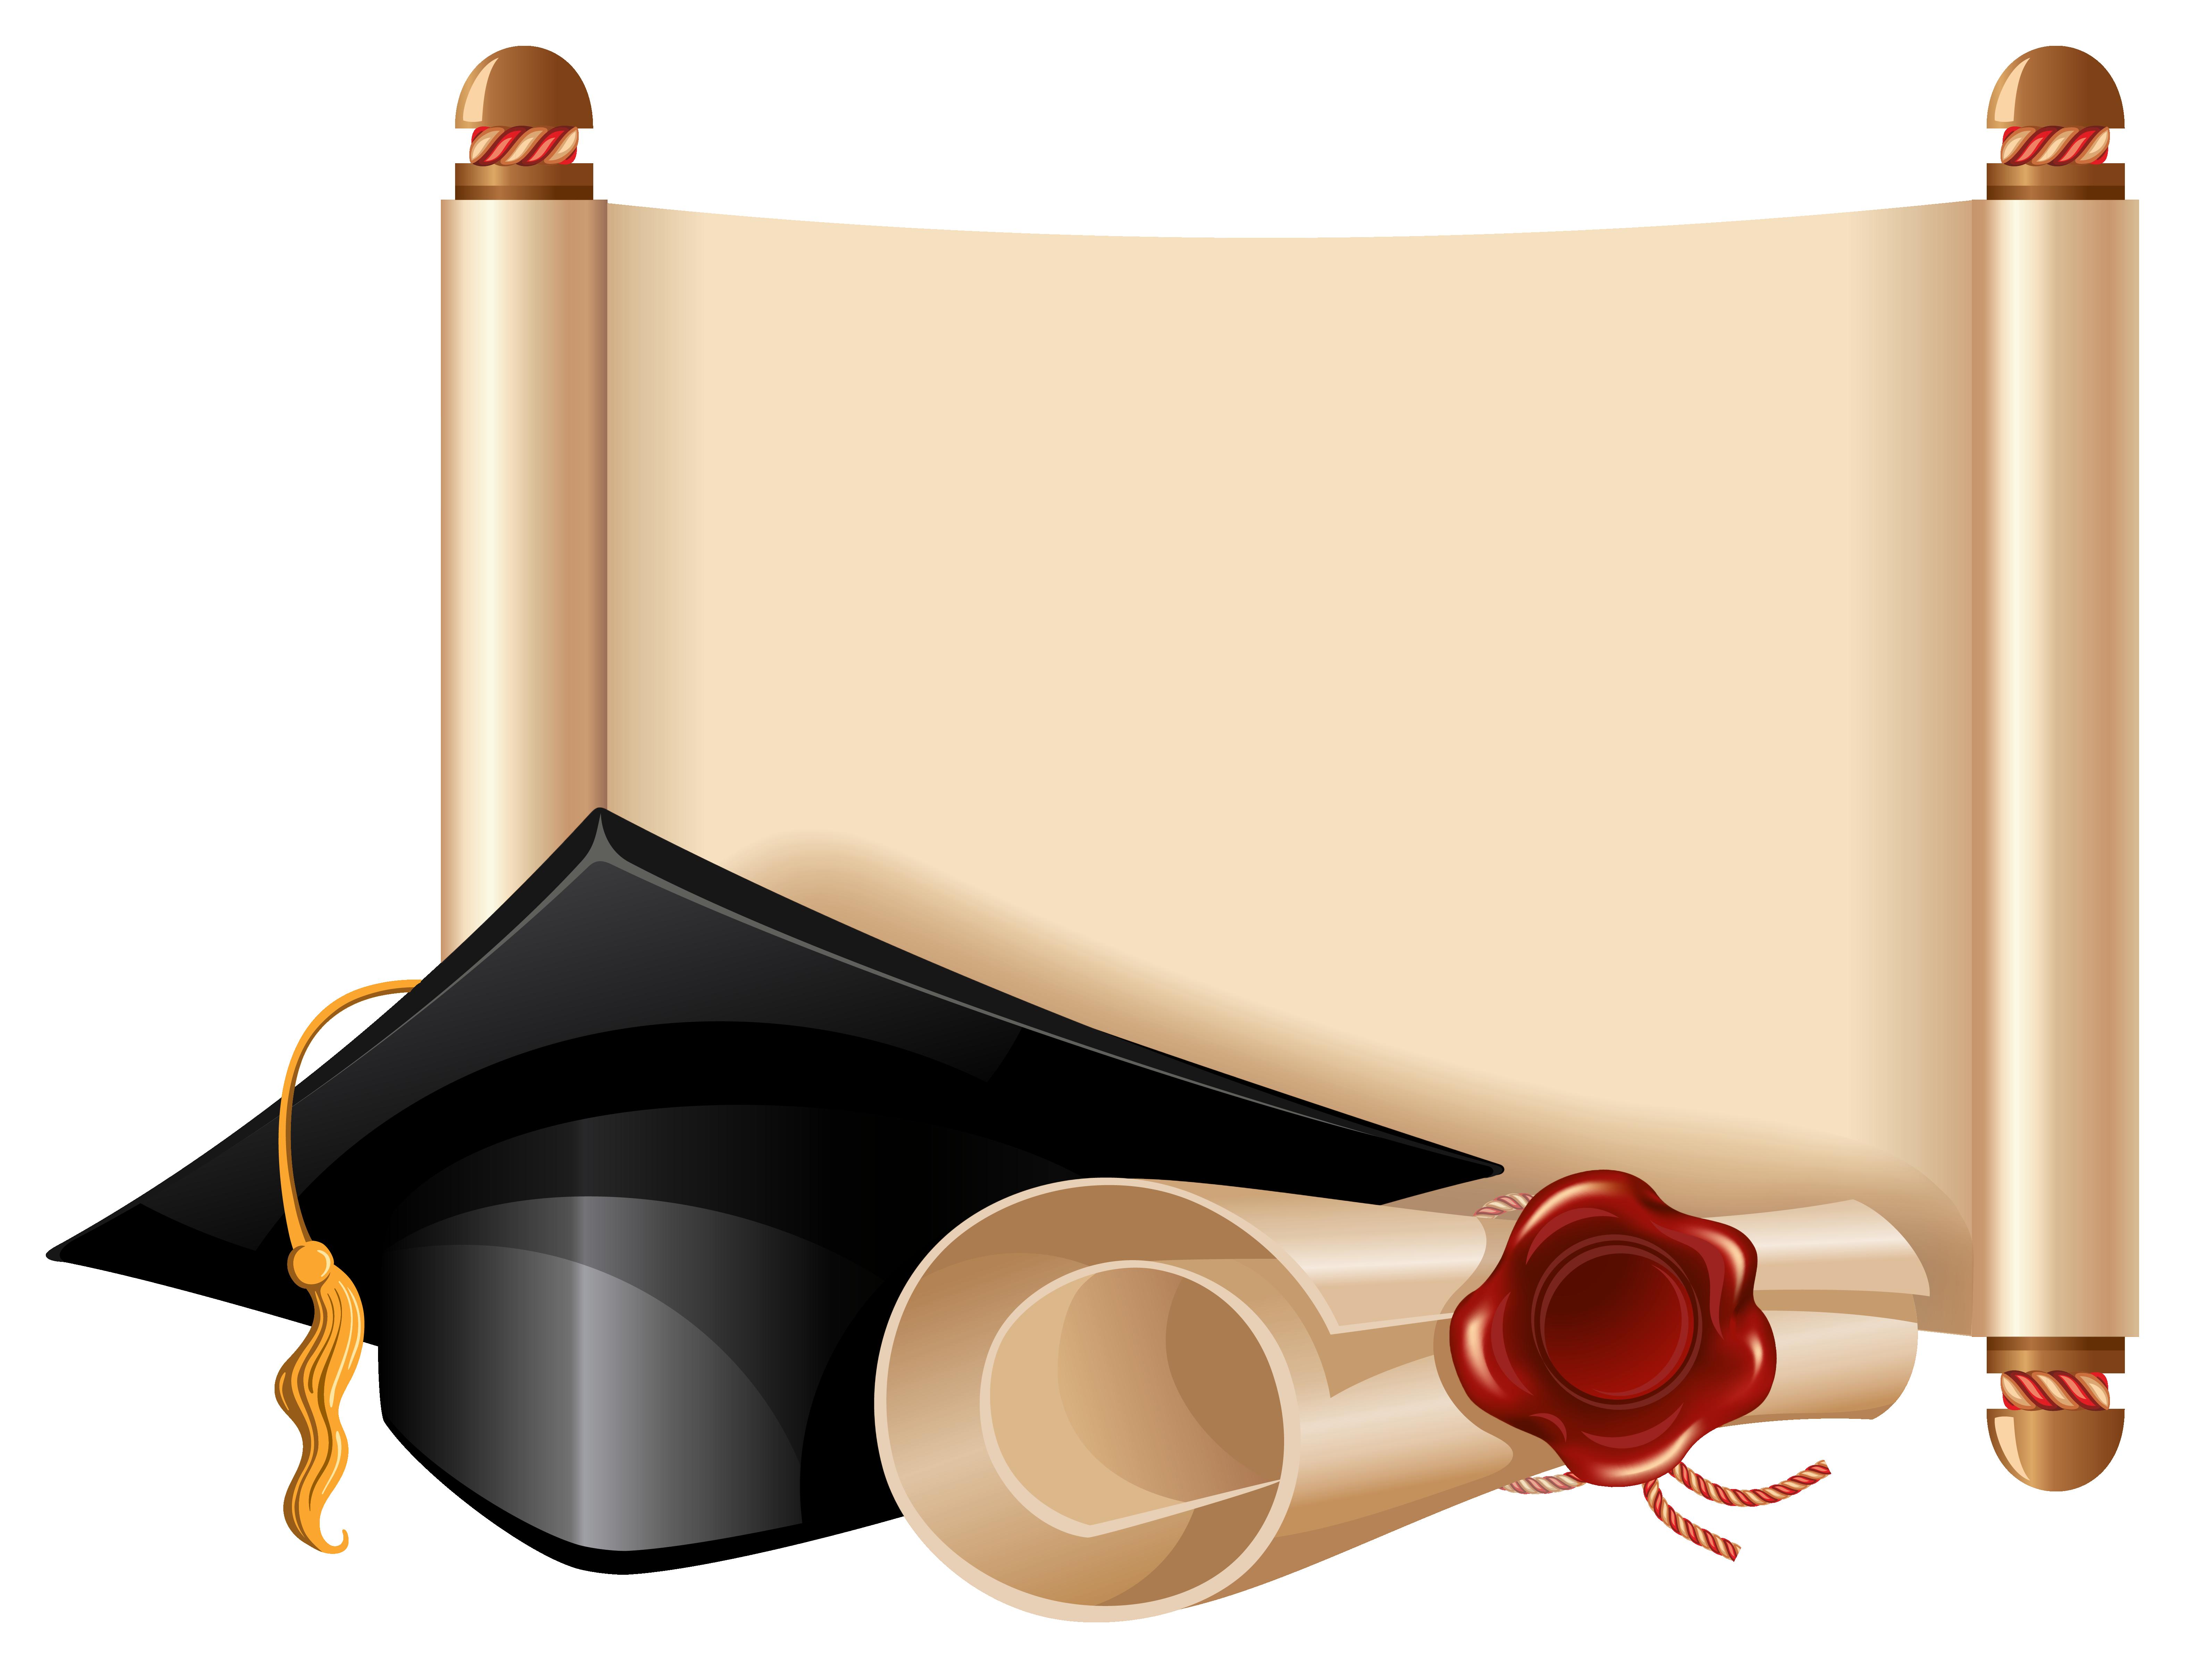 Diploma and cap clipart. Graduation frame png